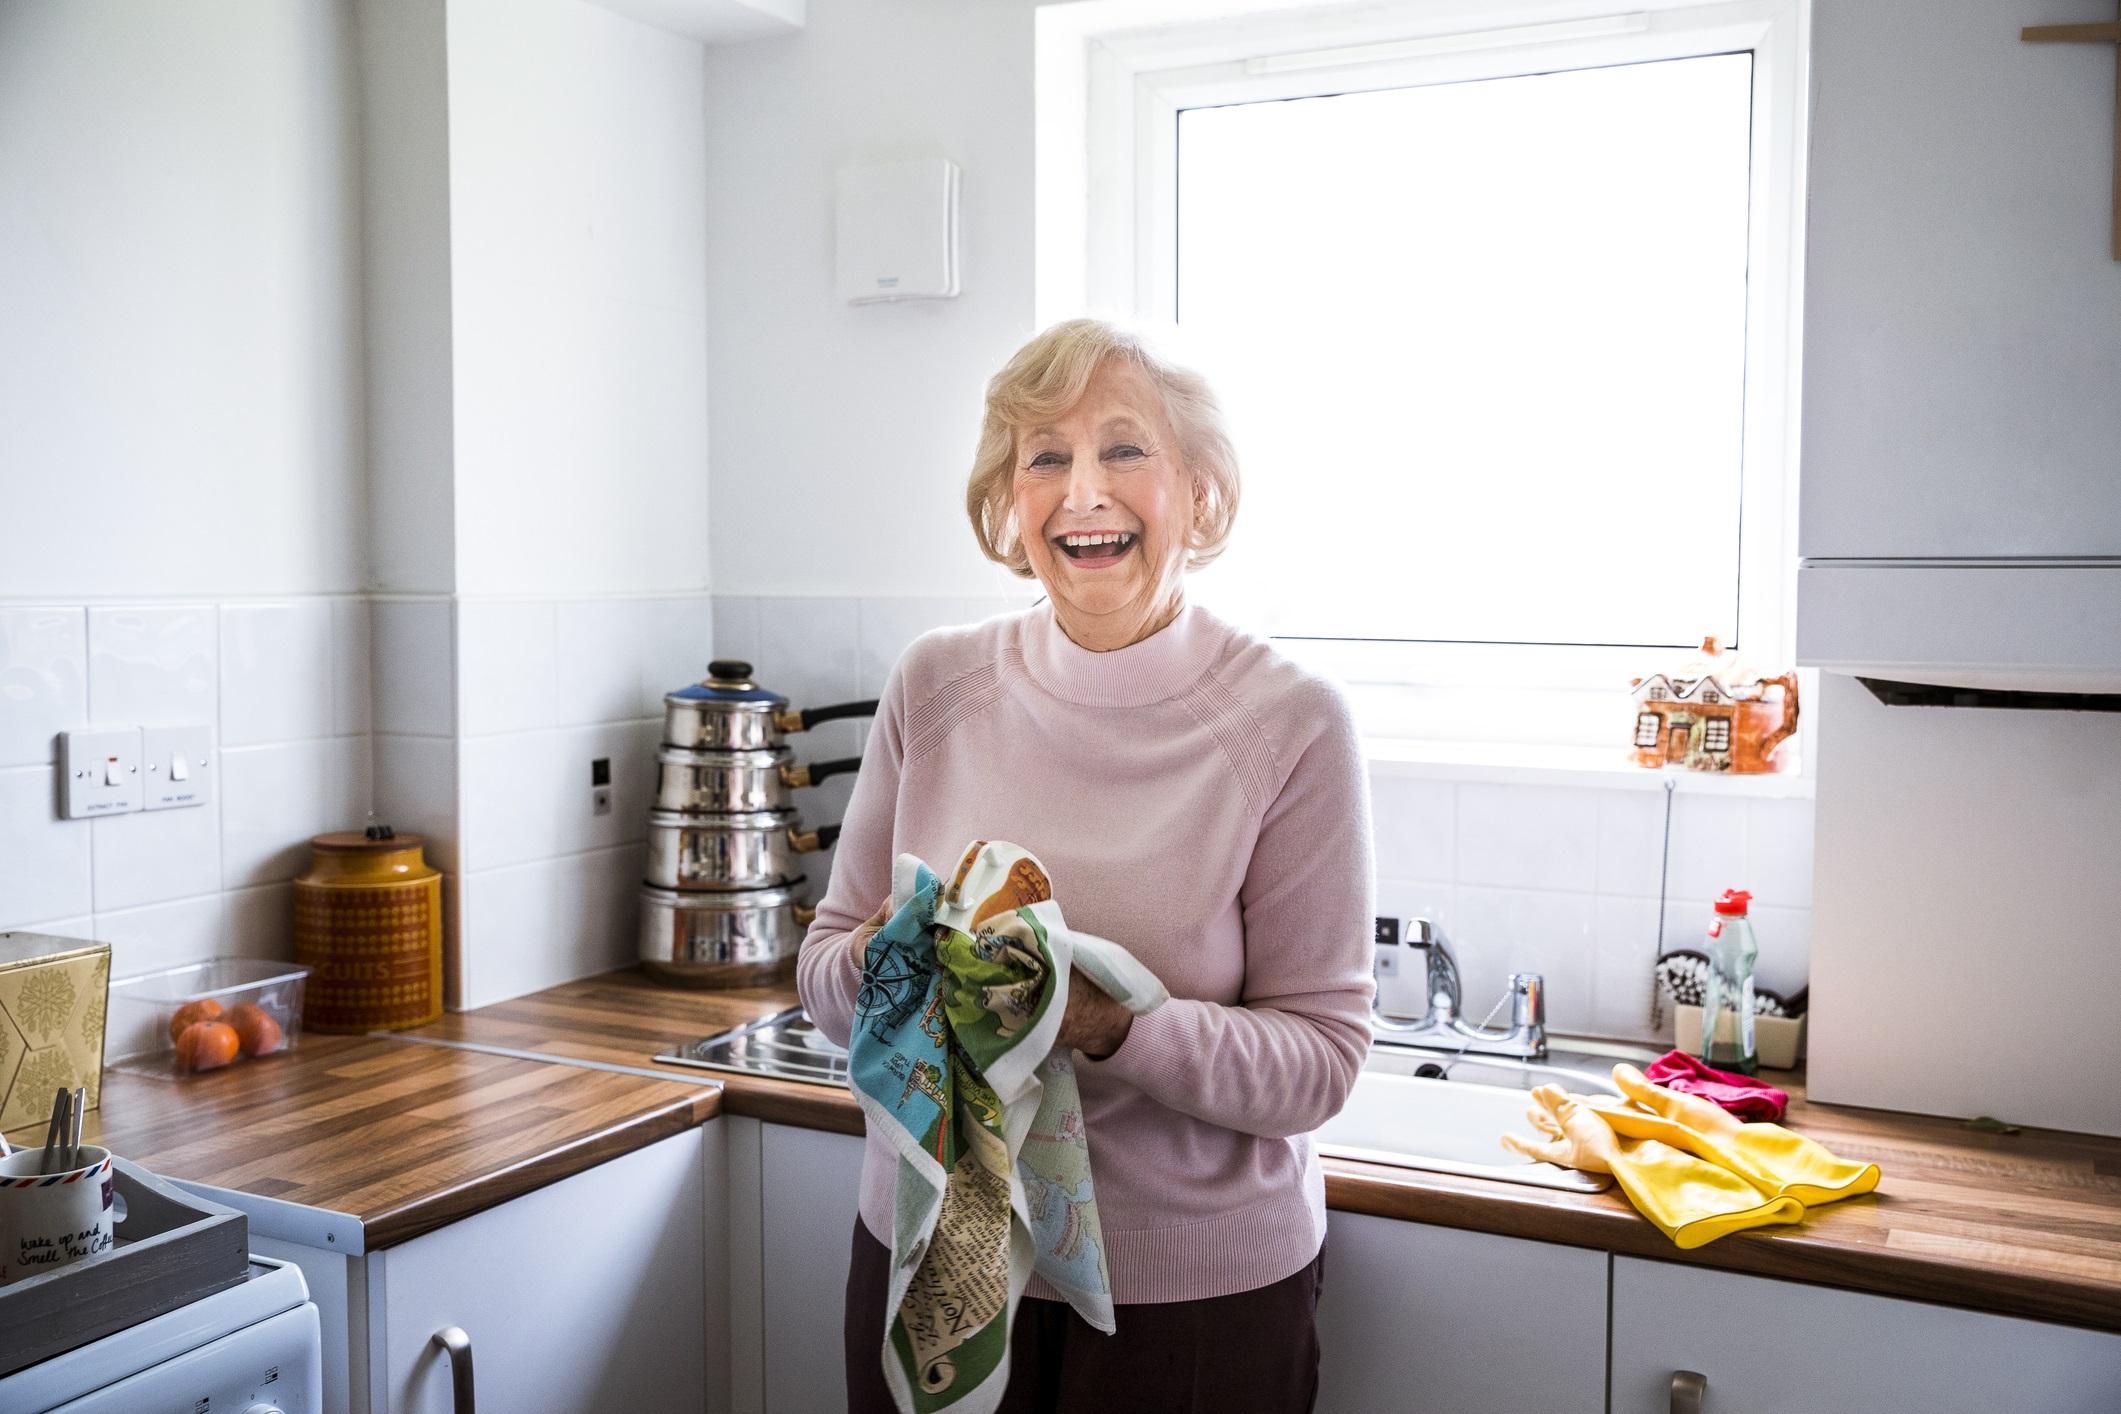 Senior lady laughing in kitchen